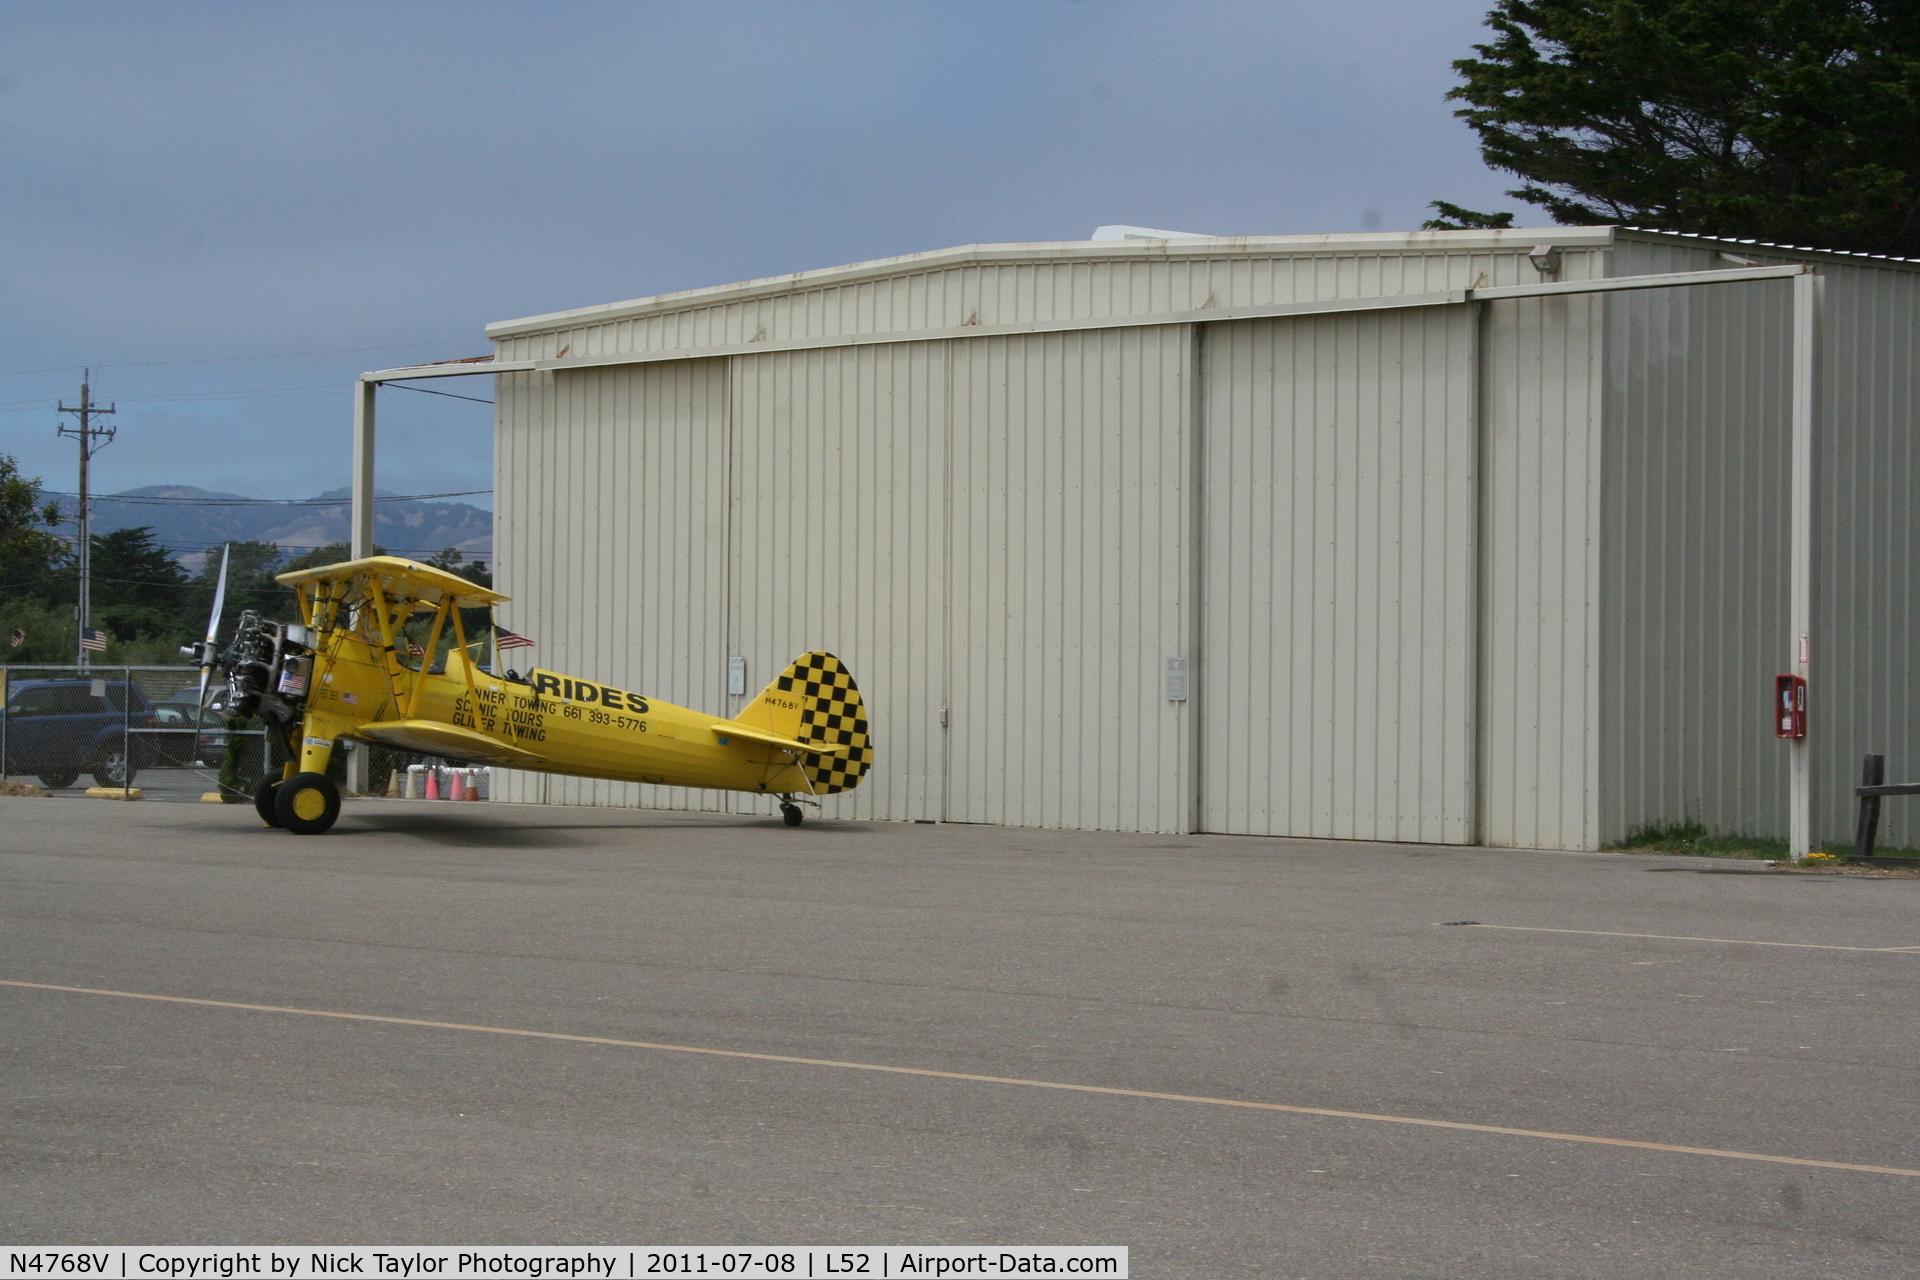 N4768V, Boeing E75 C/N 75-5737, Oceano biplane rides